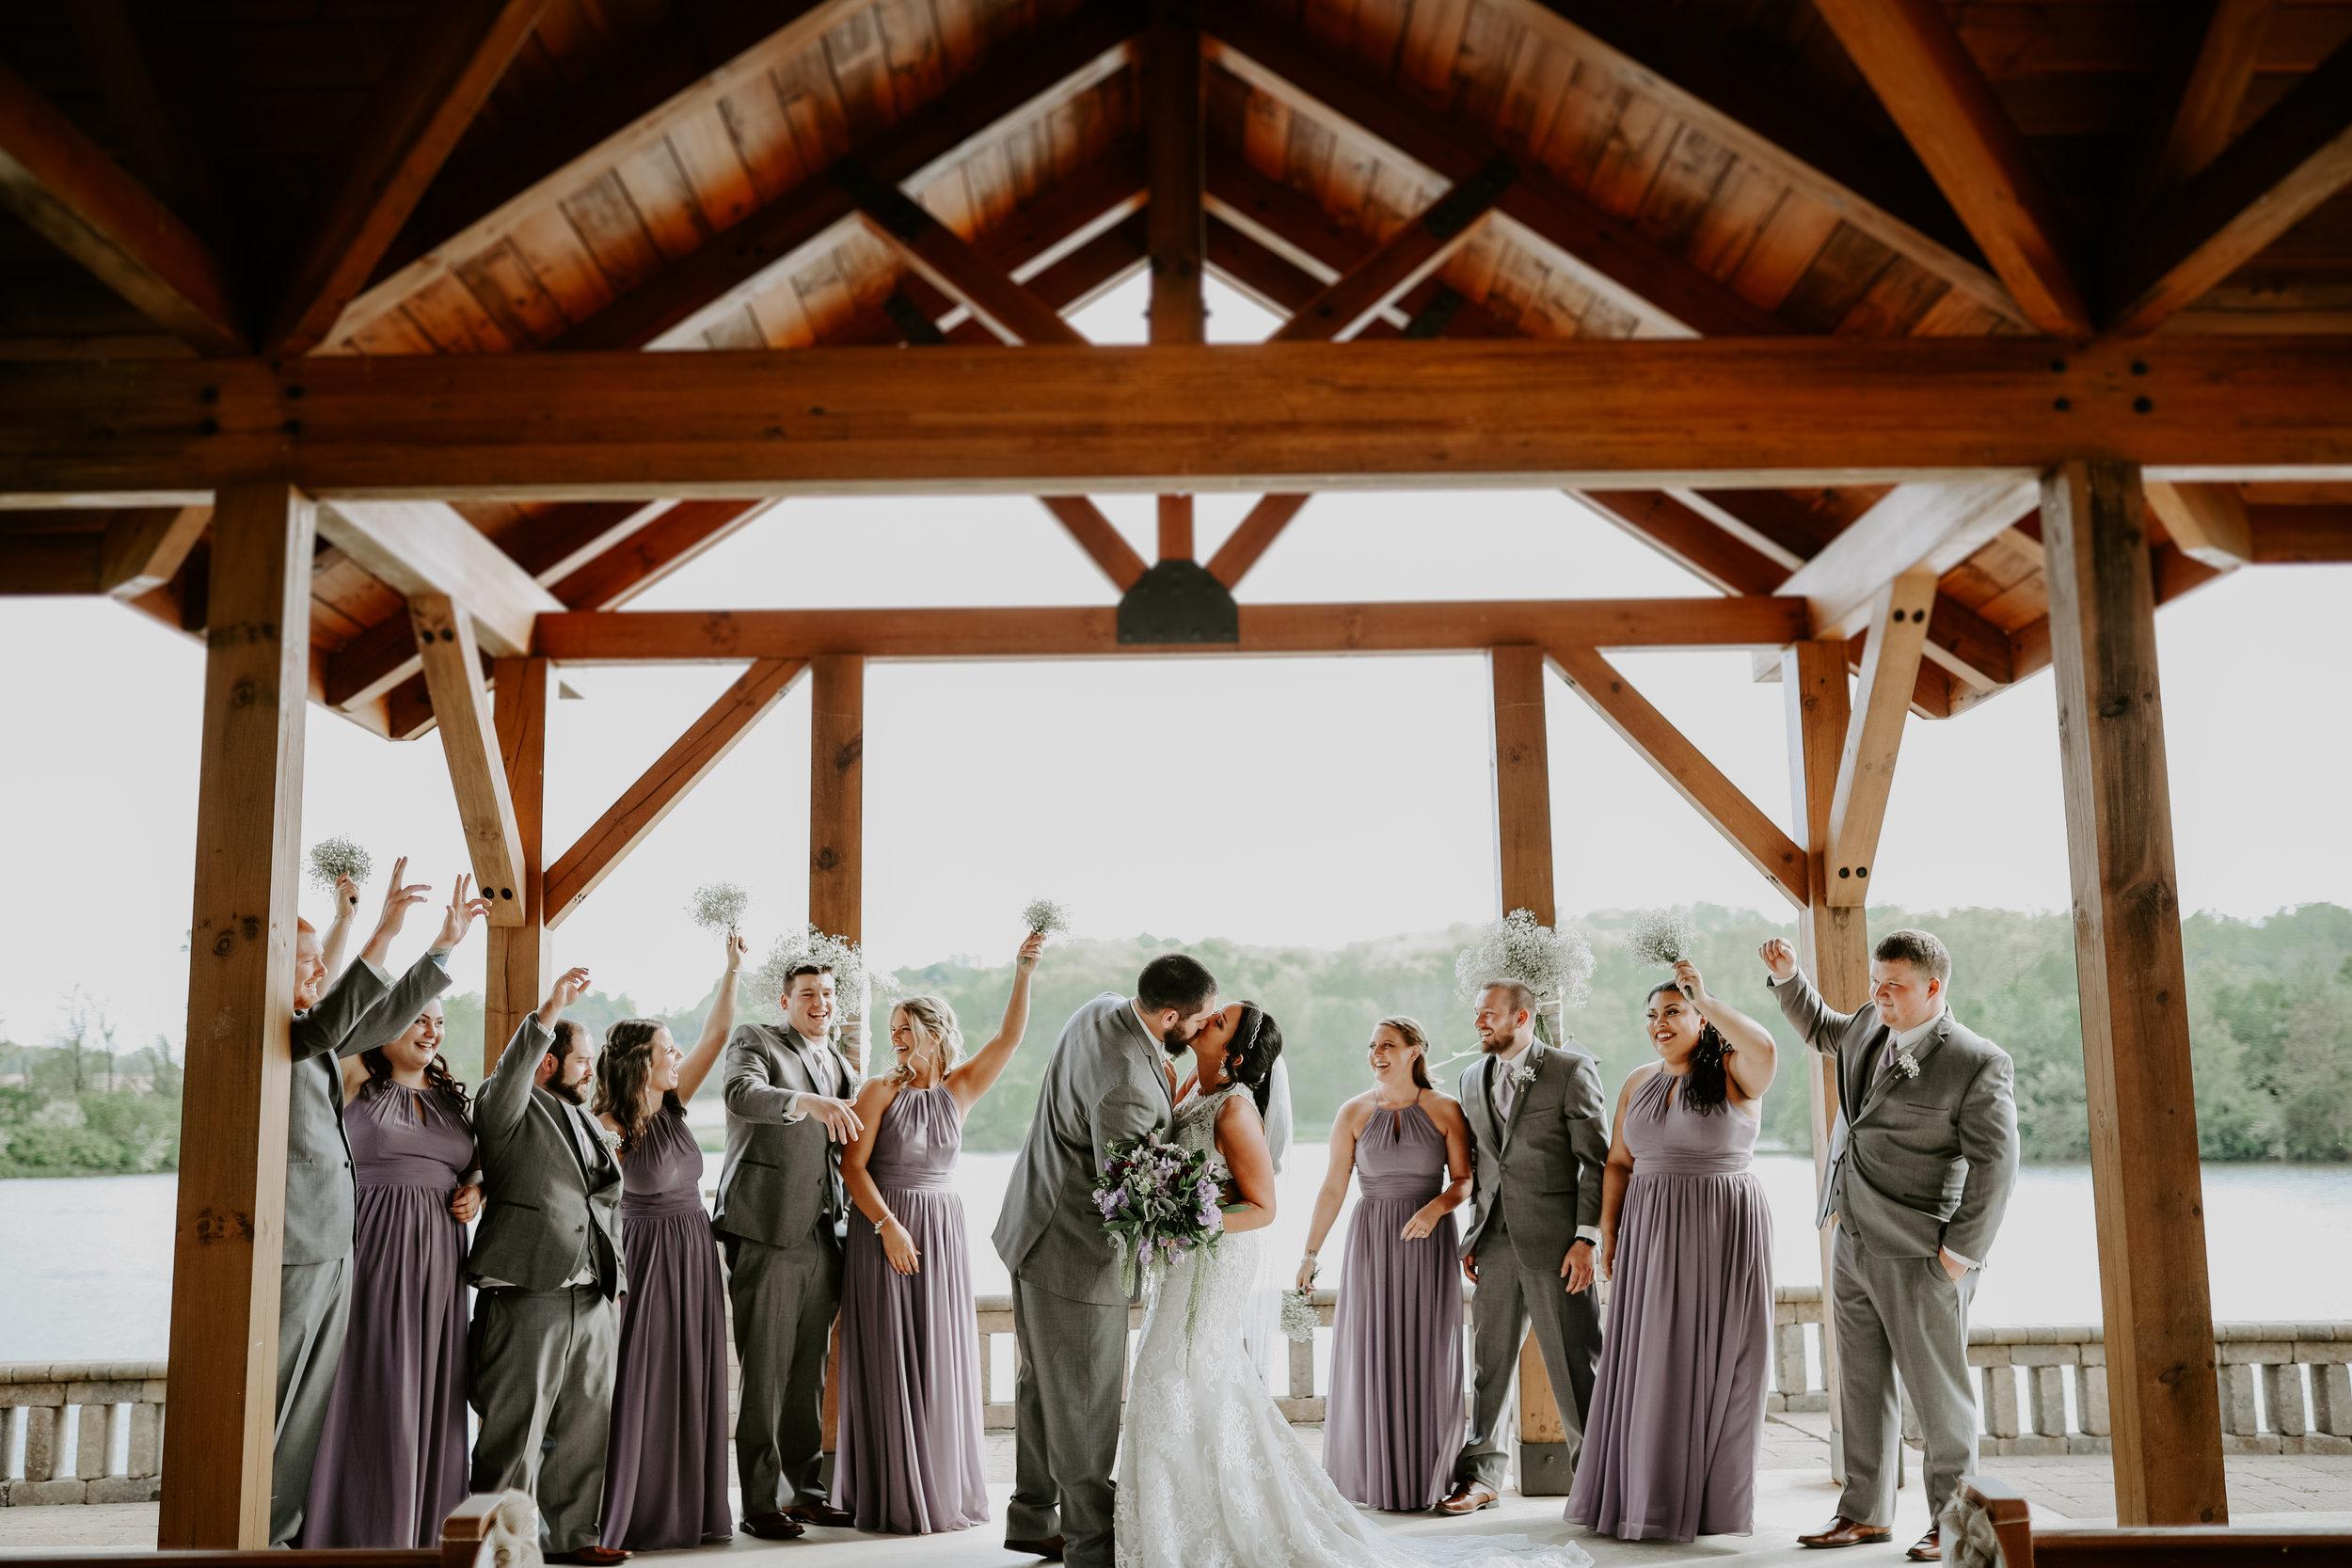 Kylei + Jordan wedding 175 (1 of 1).jpg